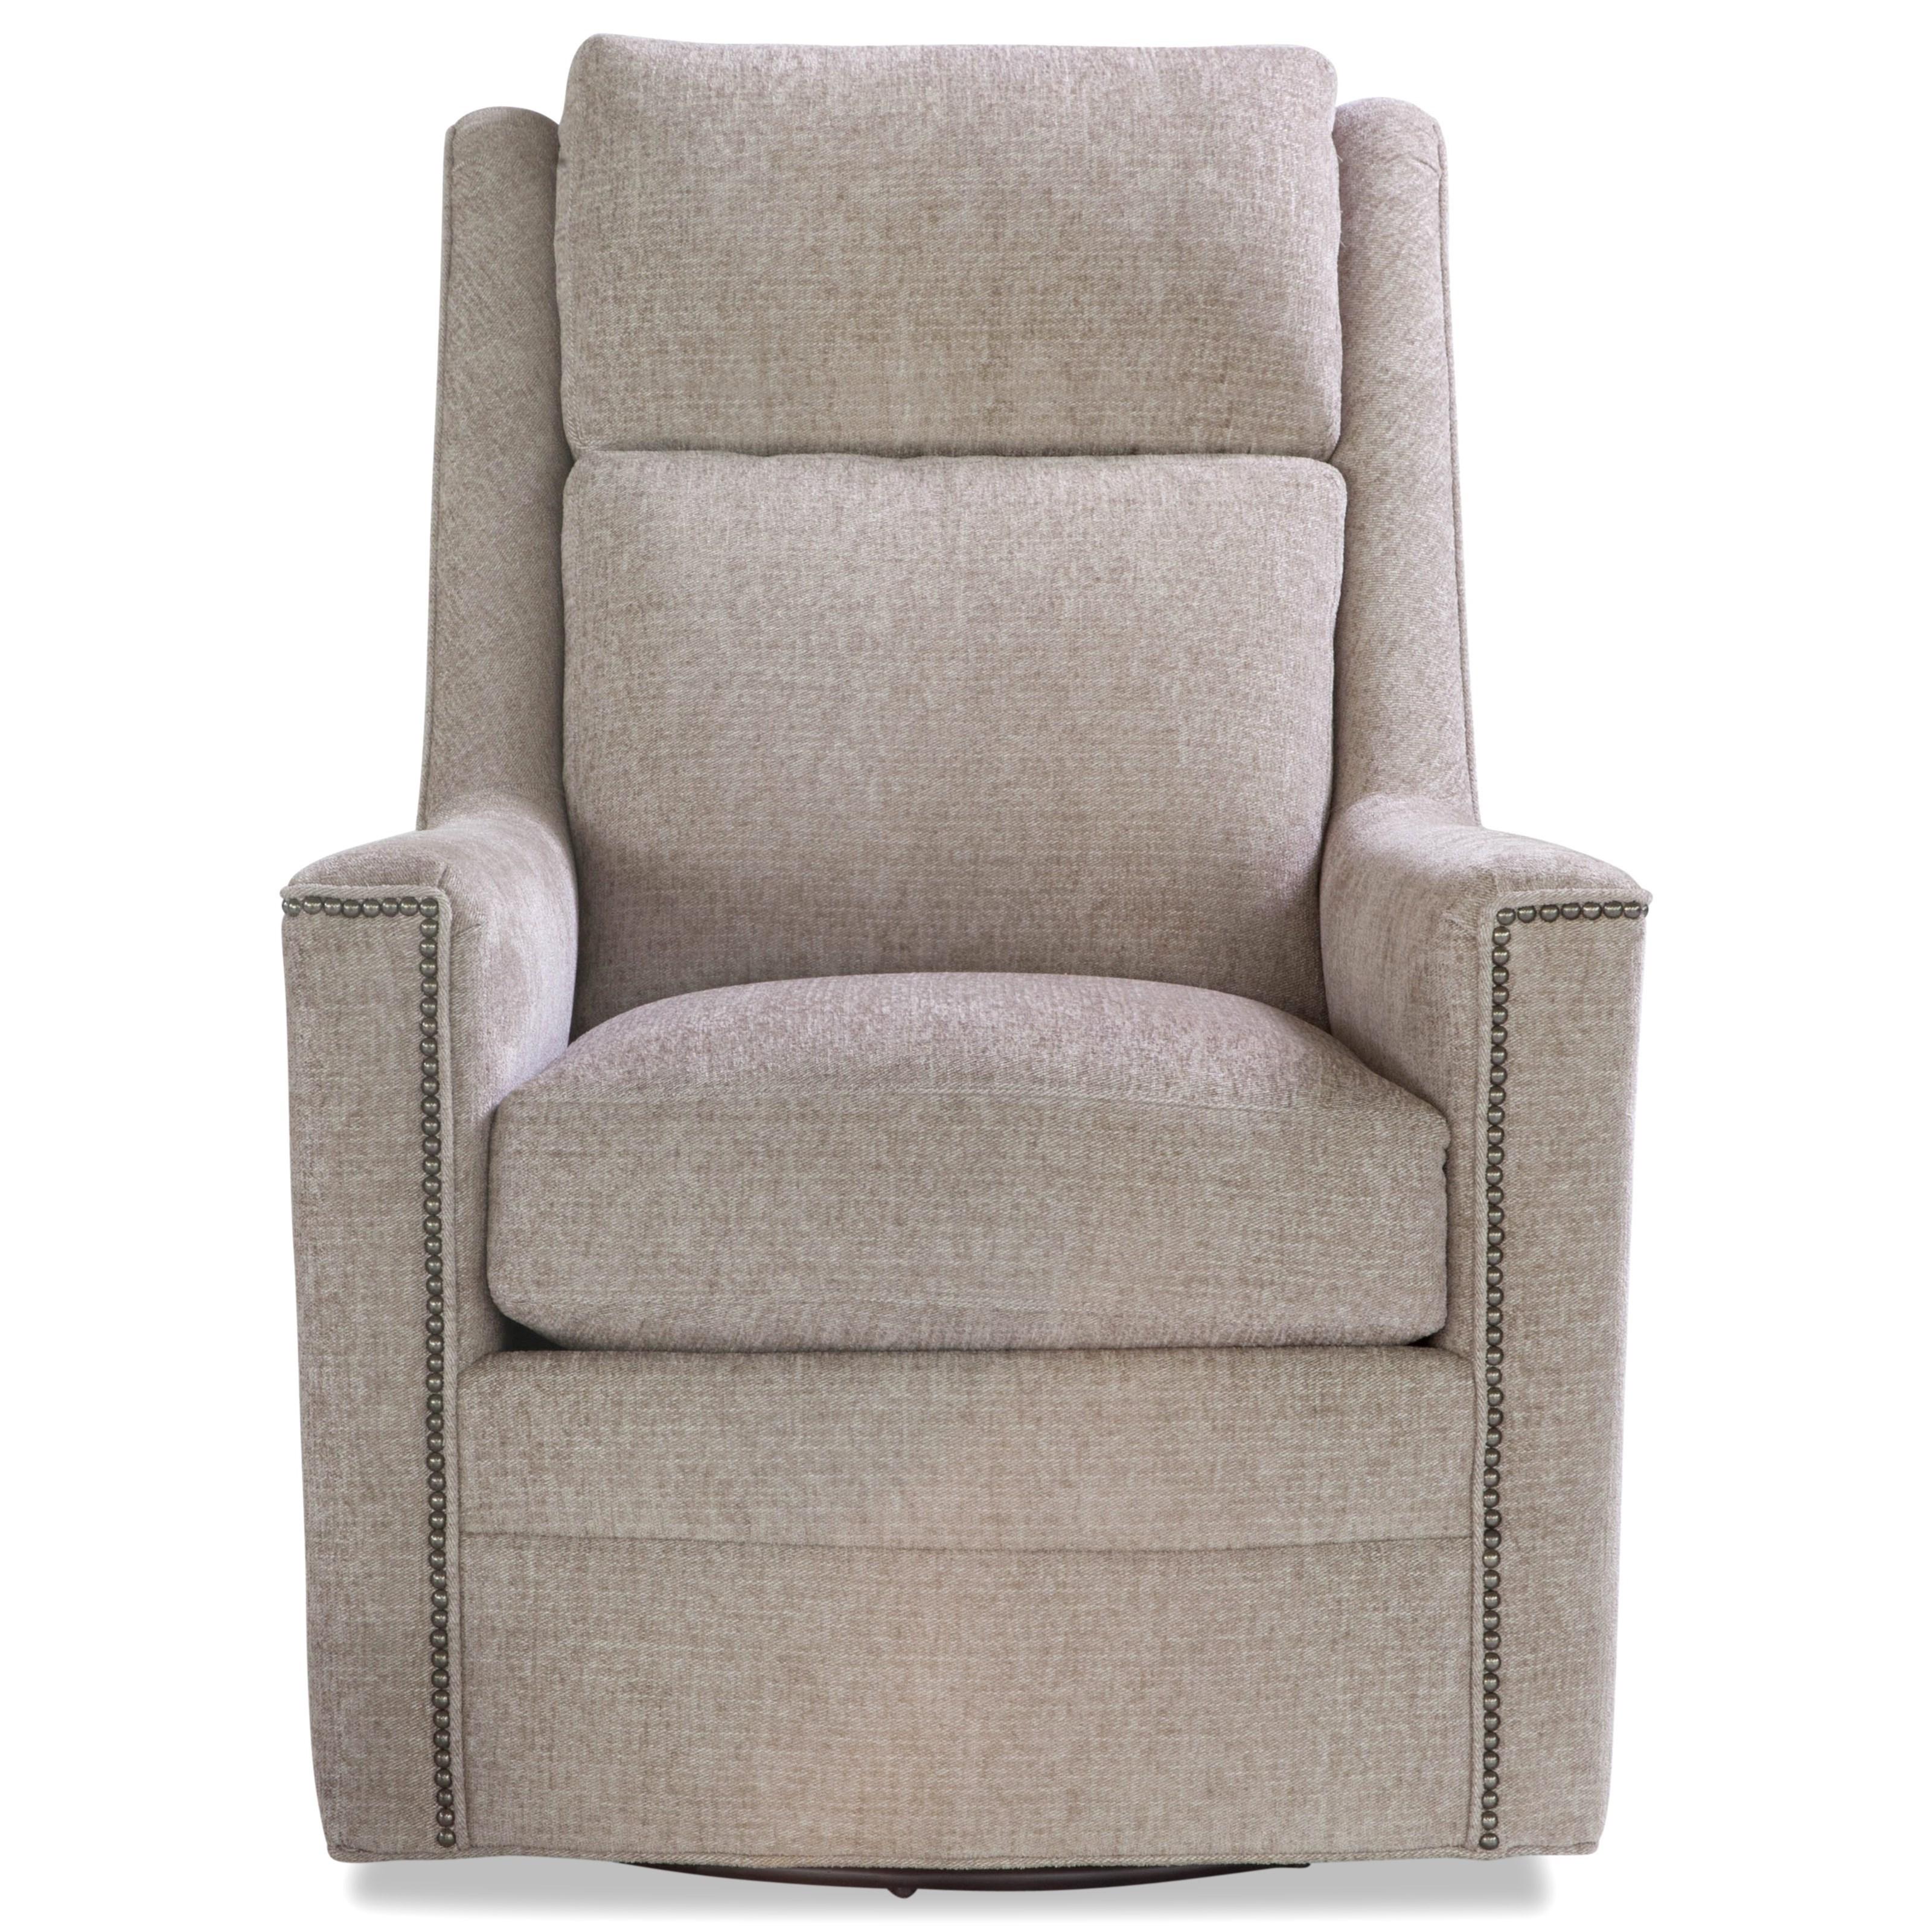 7286 Upholstered Swivel Chair by Geoffrey Alexander at Sprintz Furniture